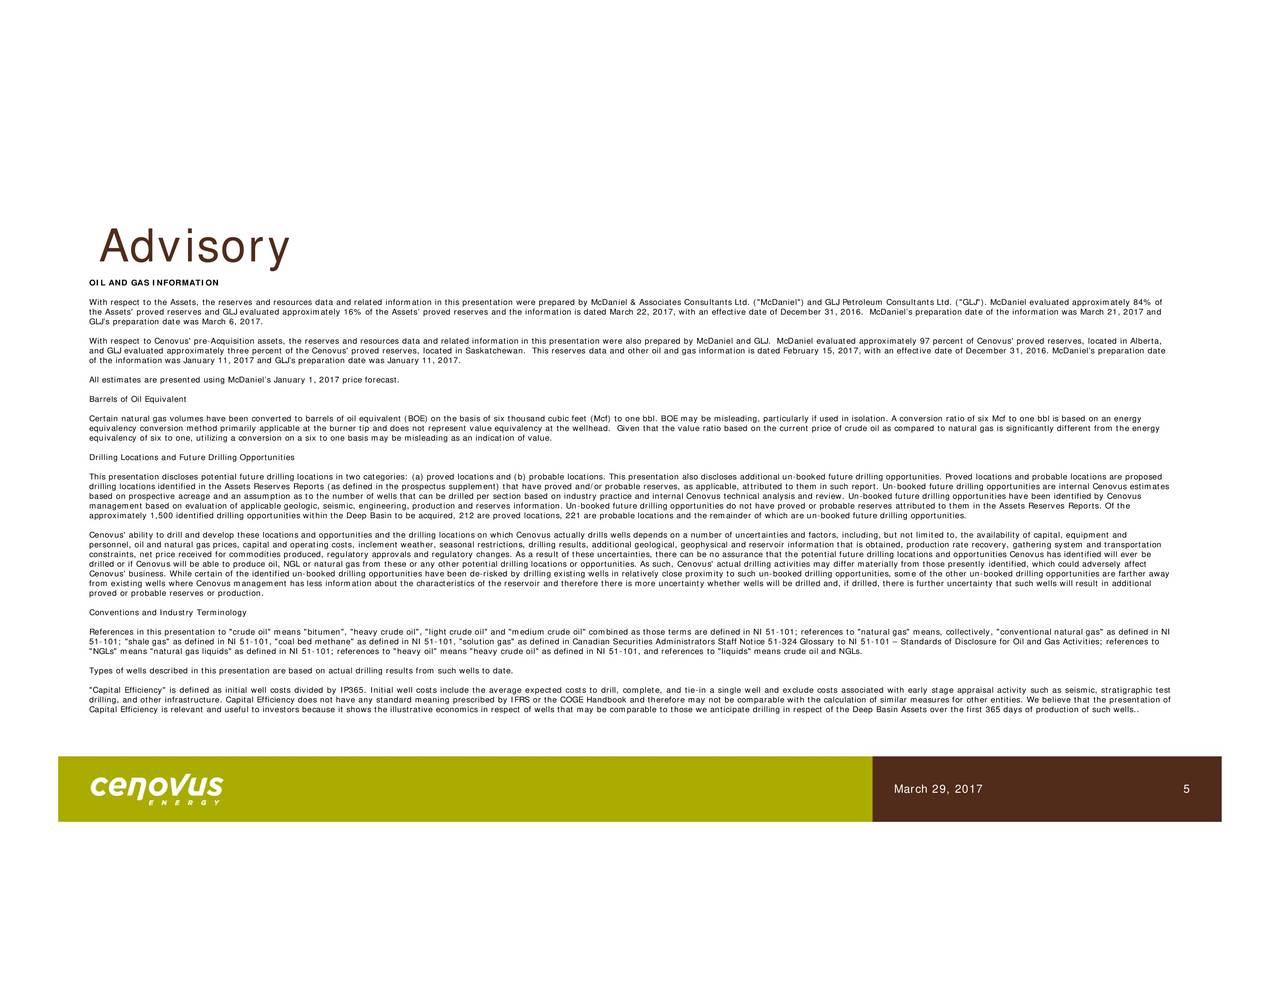 Natural Gas Co Conversion Factors